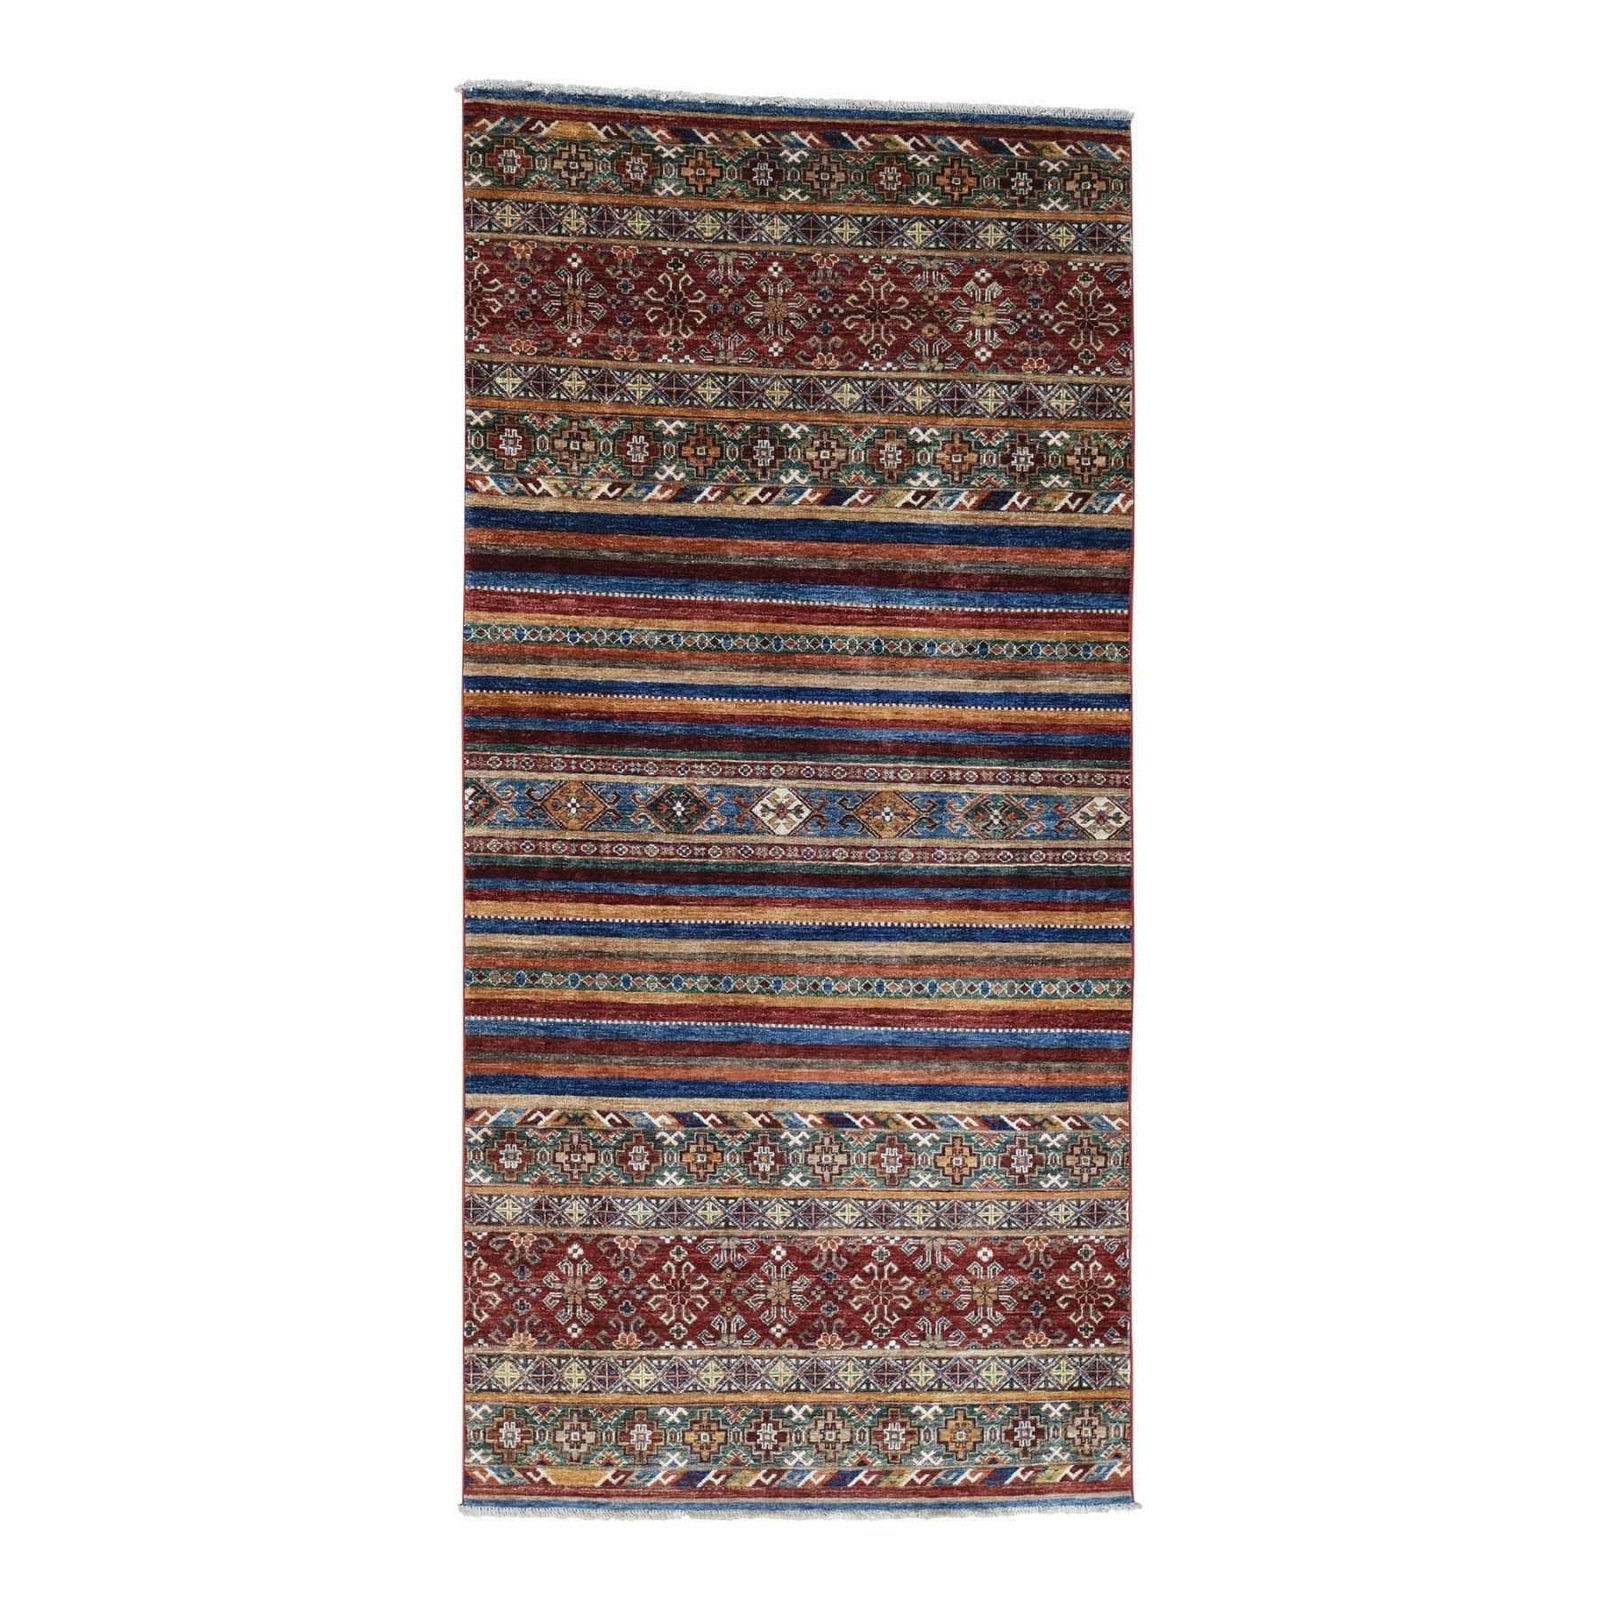 4' x 8'1 Kazak - Korjin Design - Hand-Knotted - Pure Wool